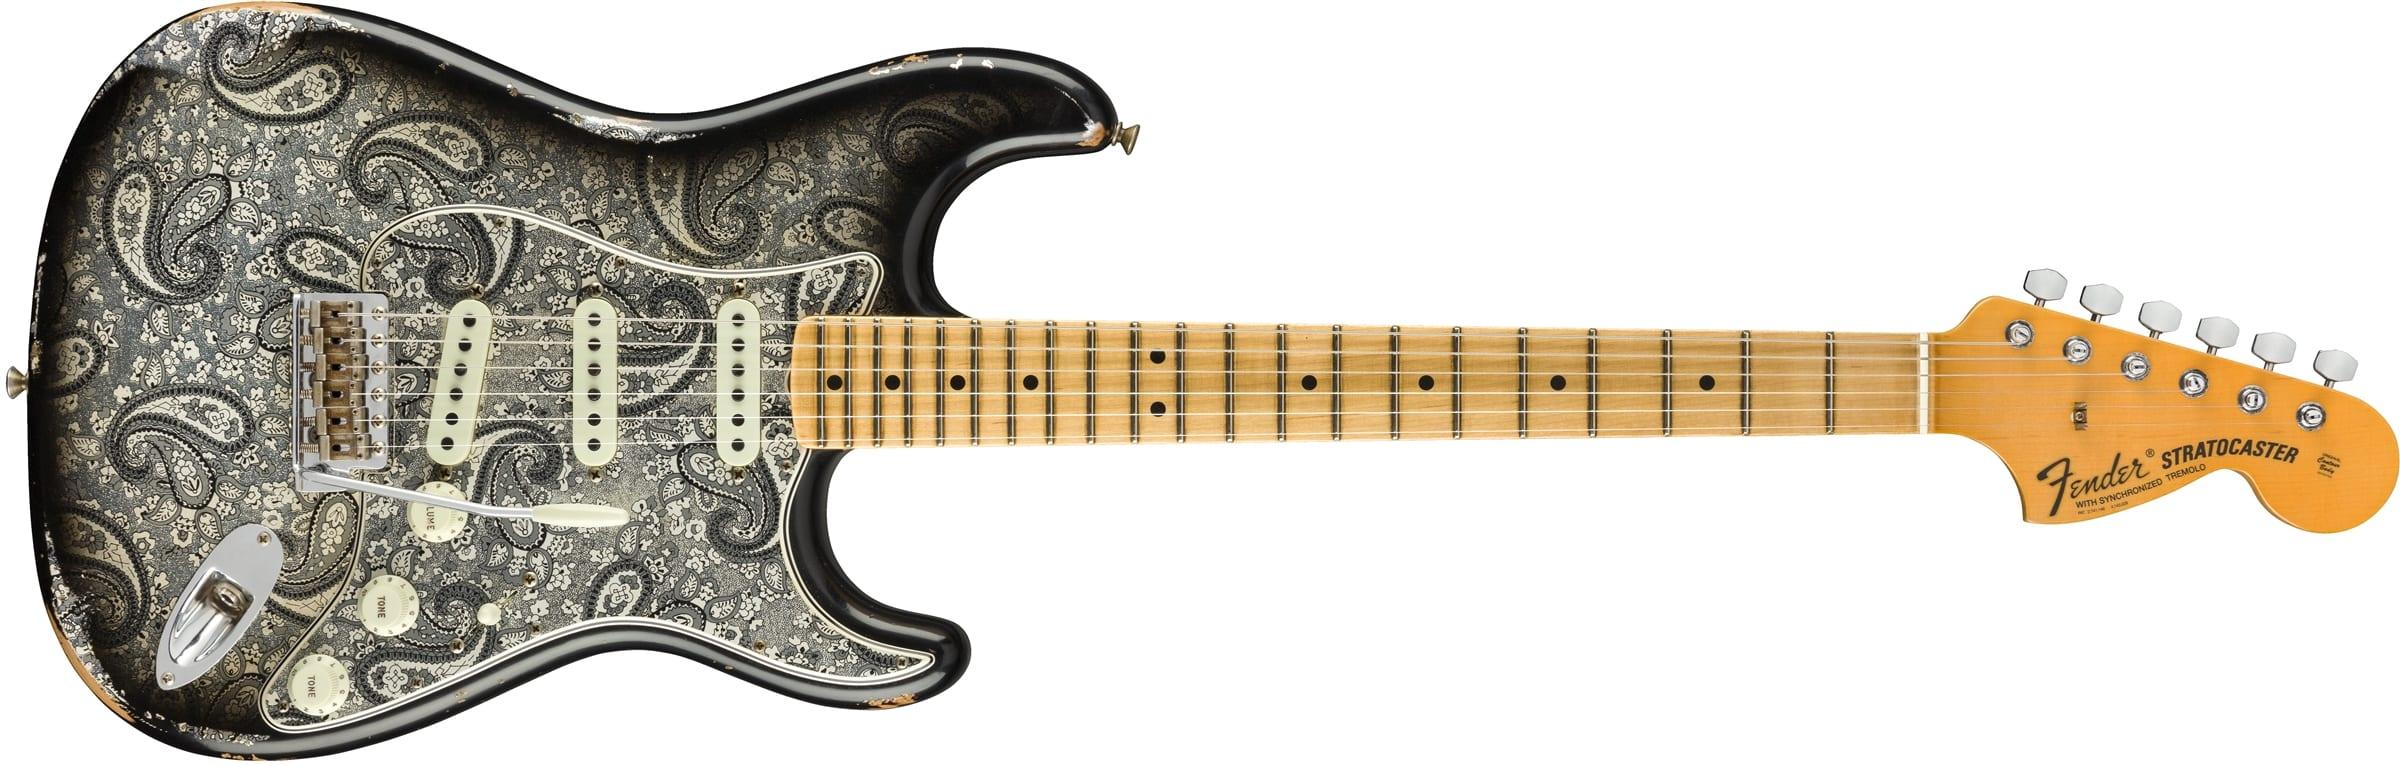 Fender Custom Shop 2018 Limited 1968 Black Paisley Stratocaster